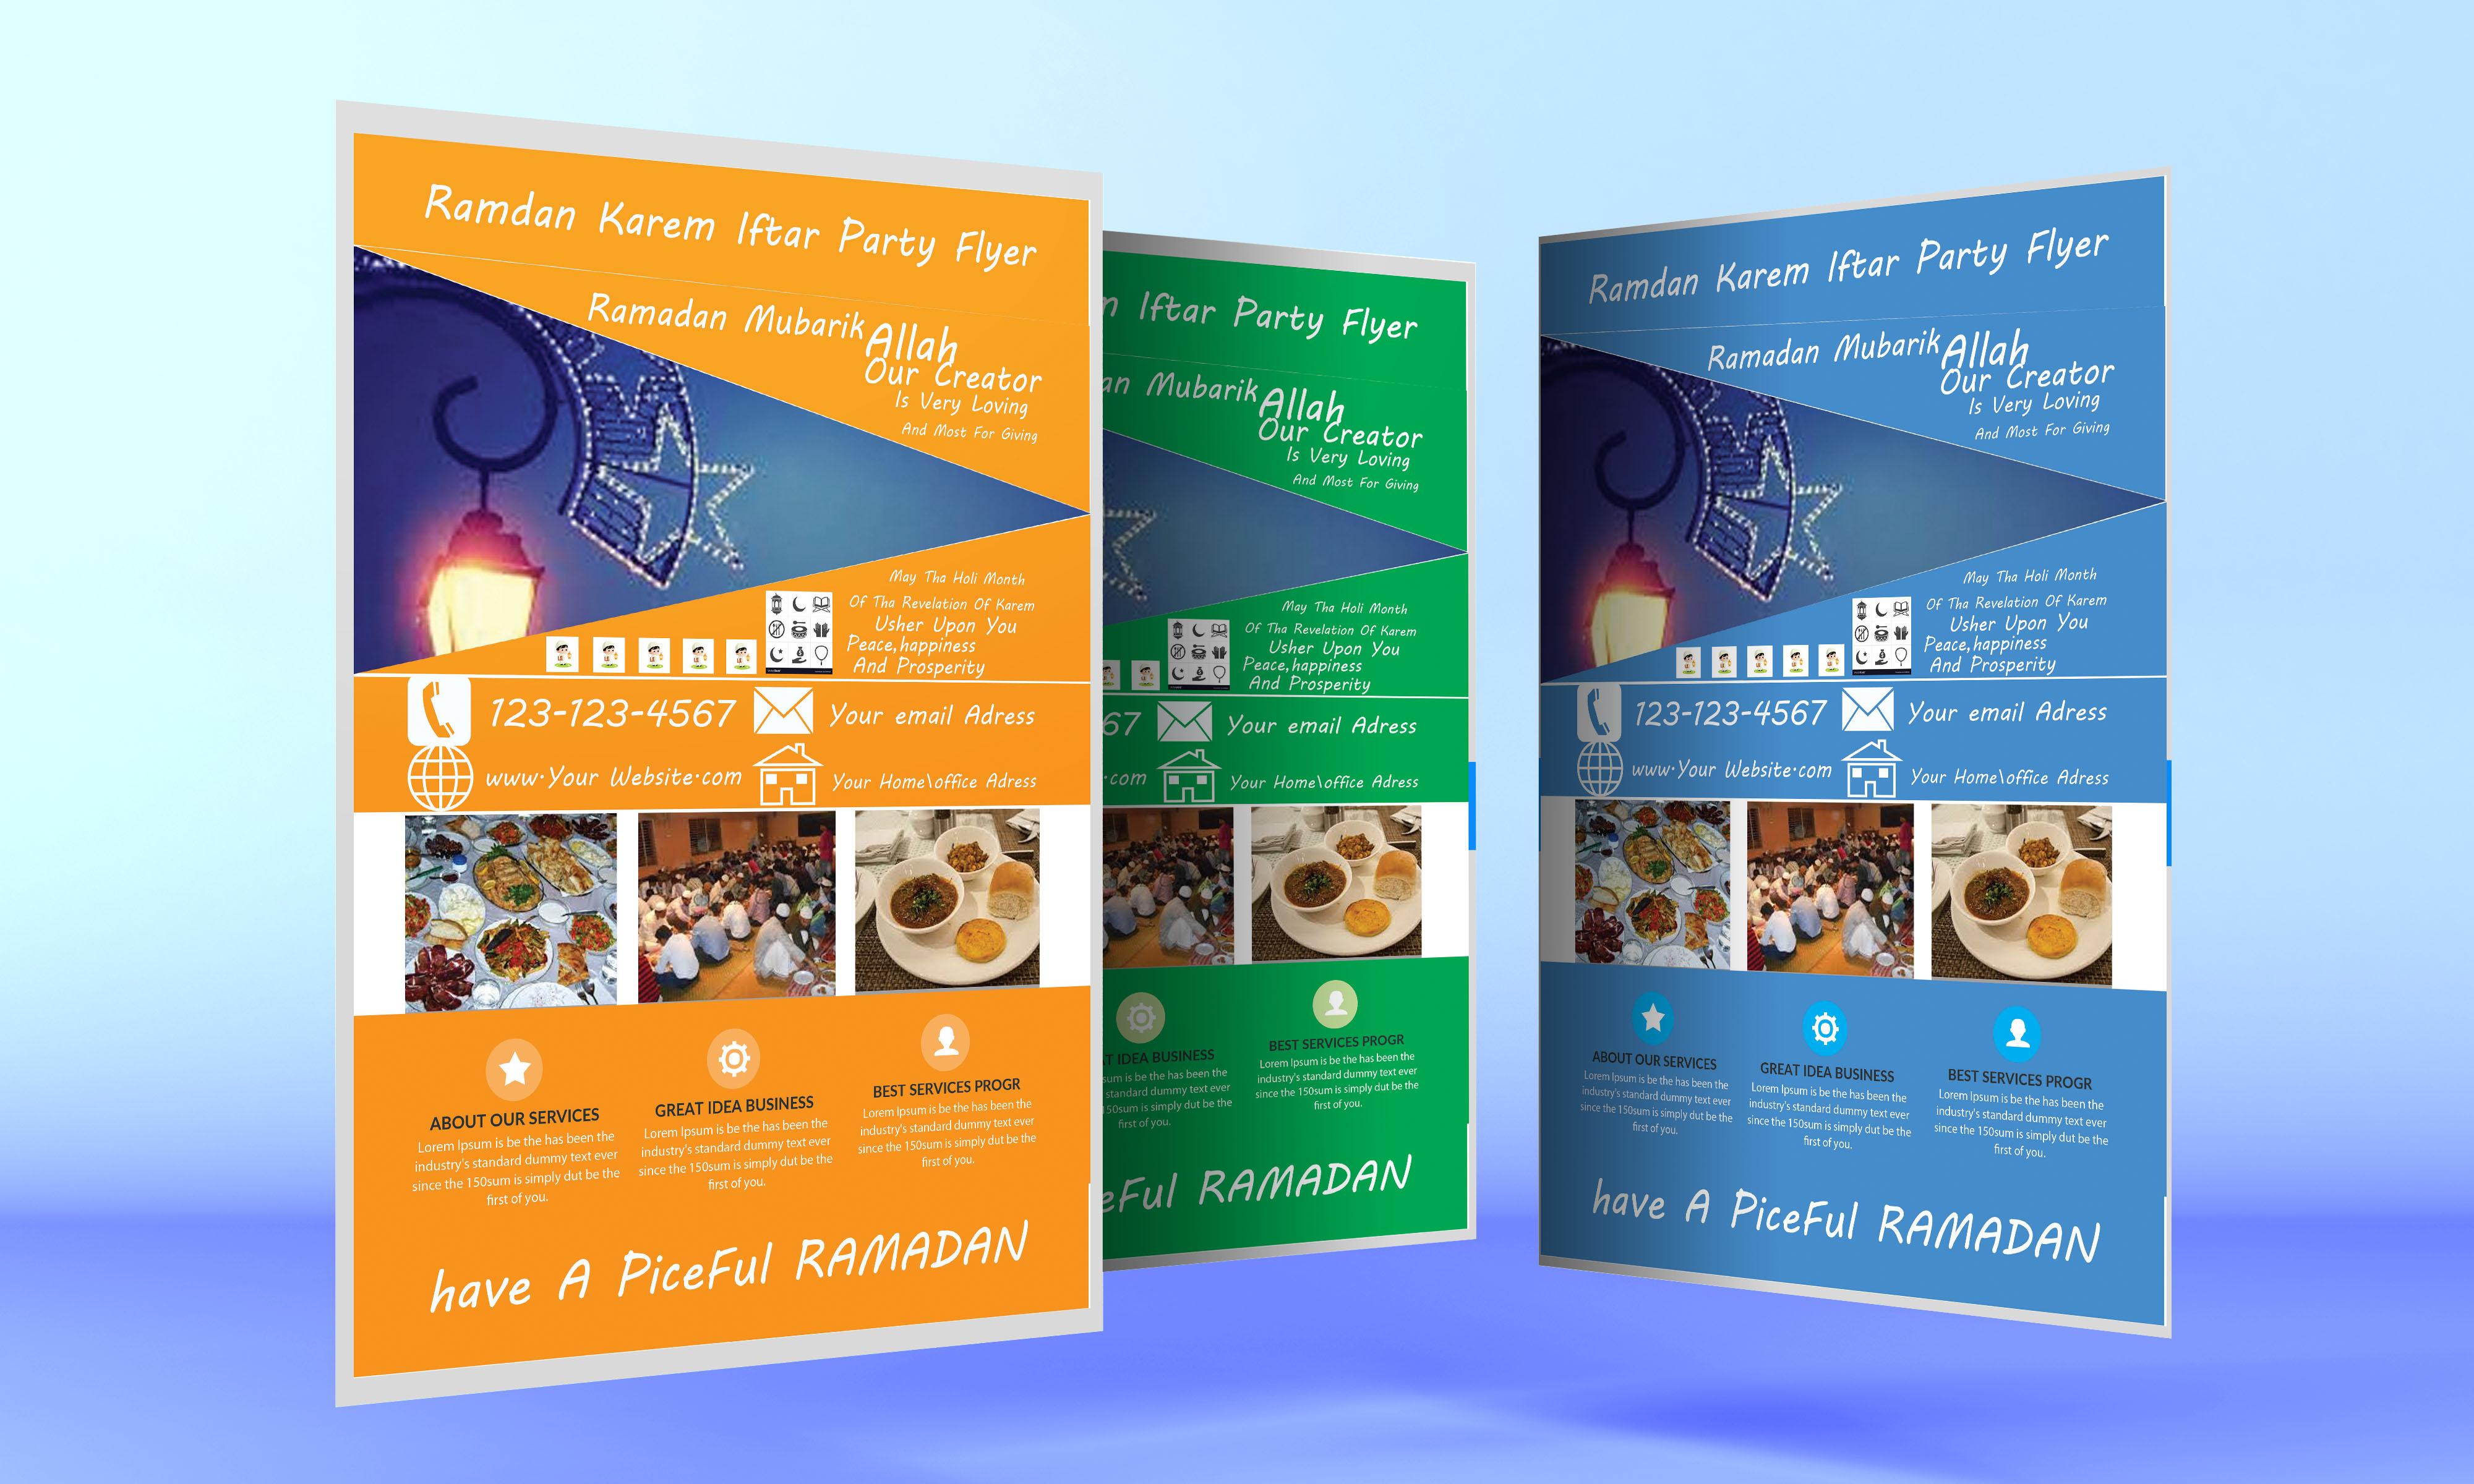 Ramadan kareem Iftar Party  Flyer example image 2